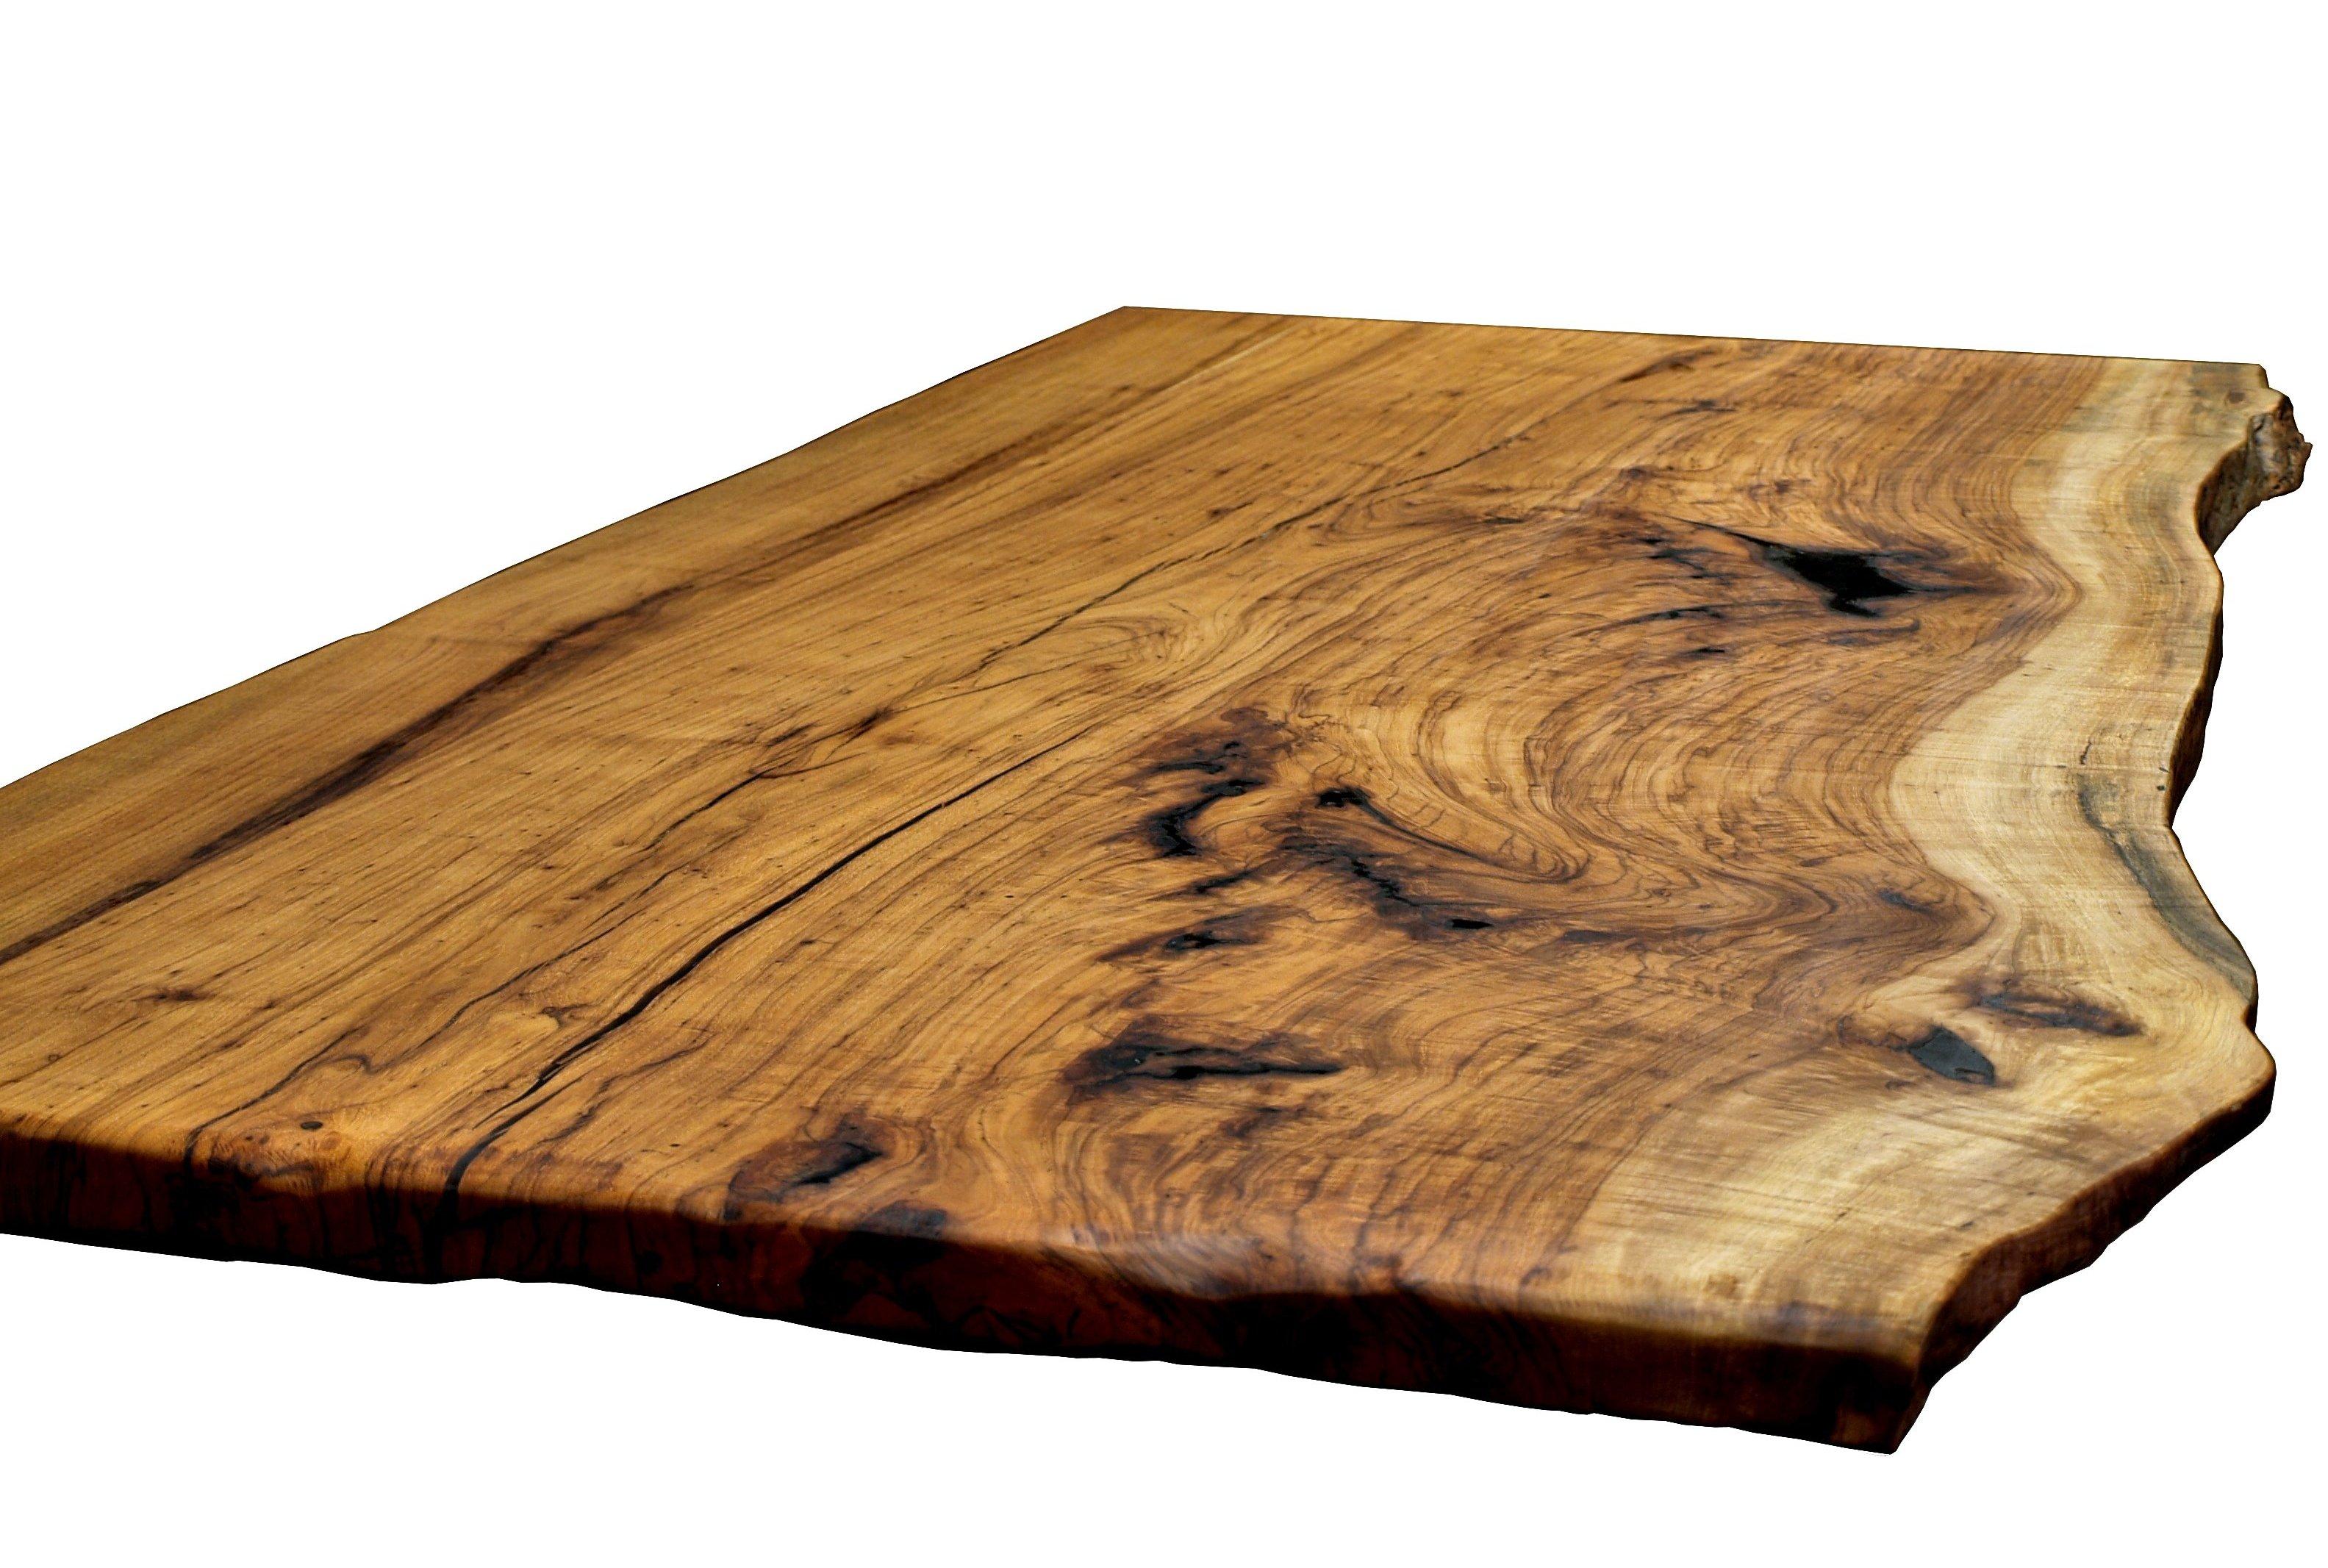 Pecan Wood Finish Plans DIY Free Download log end table ...